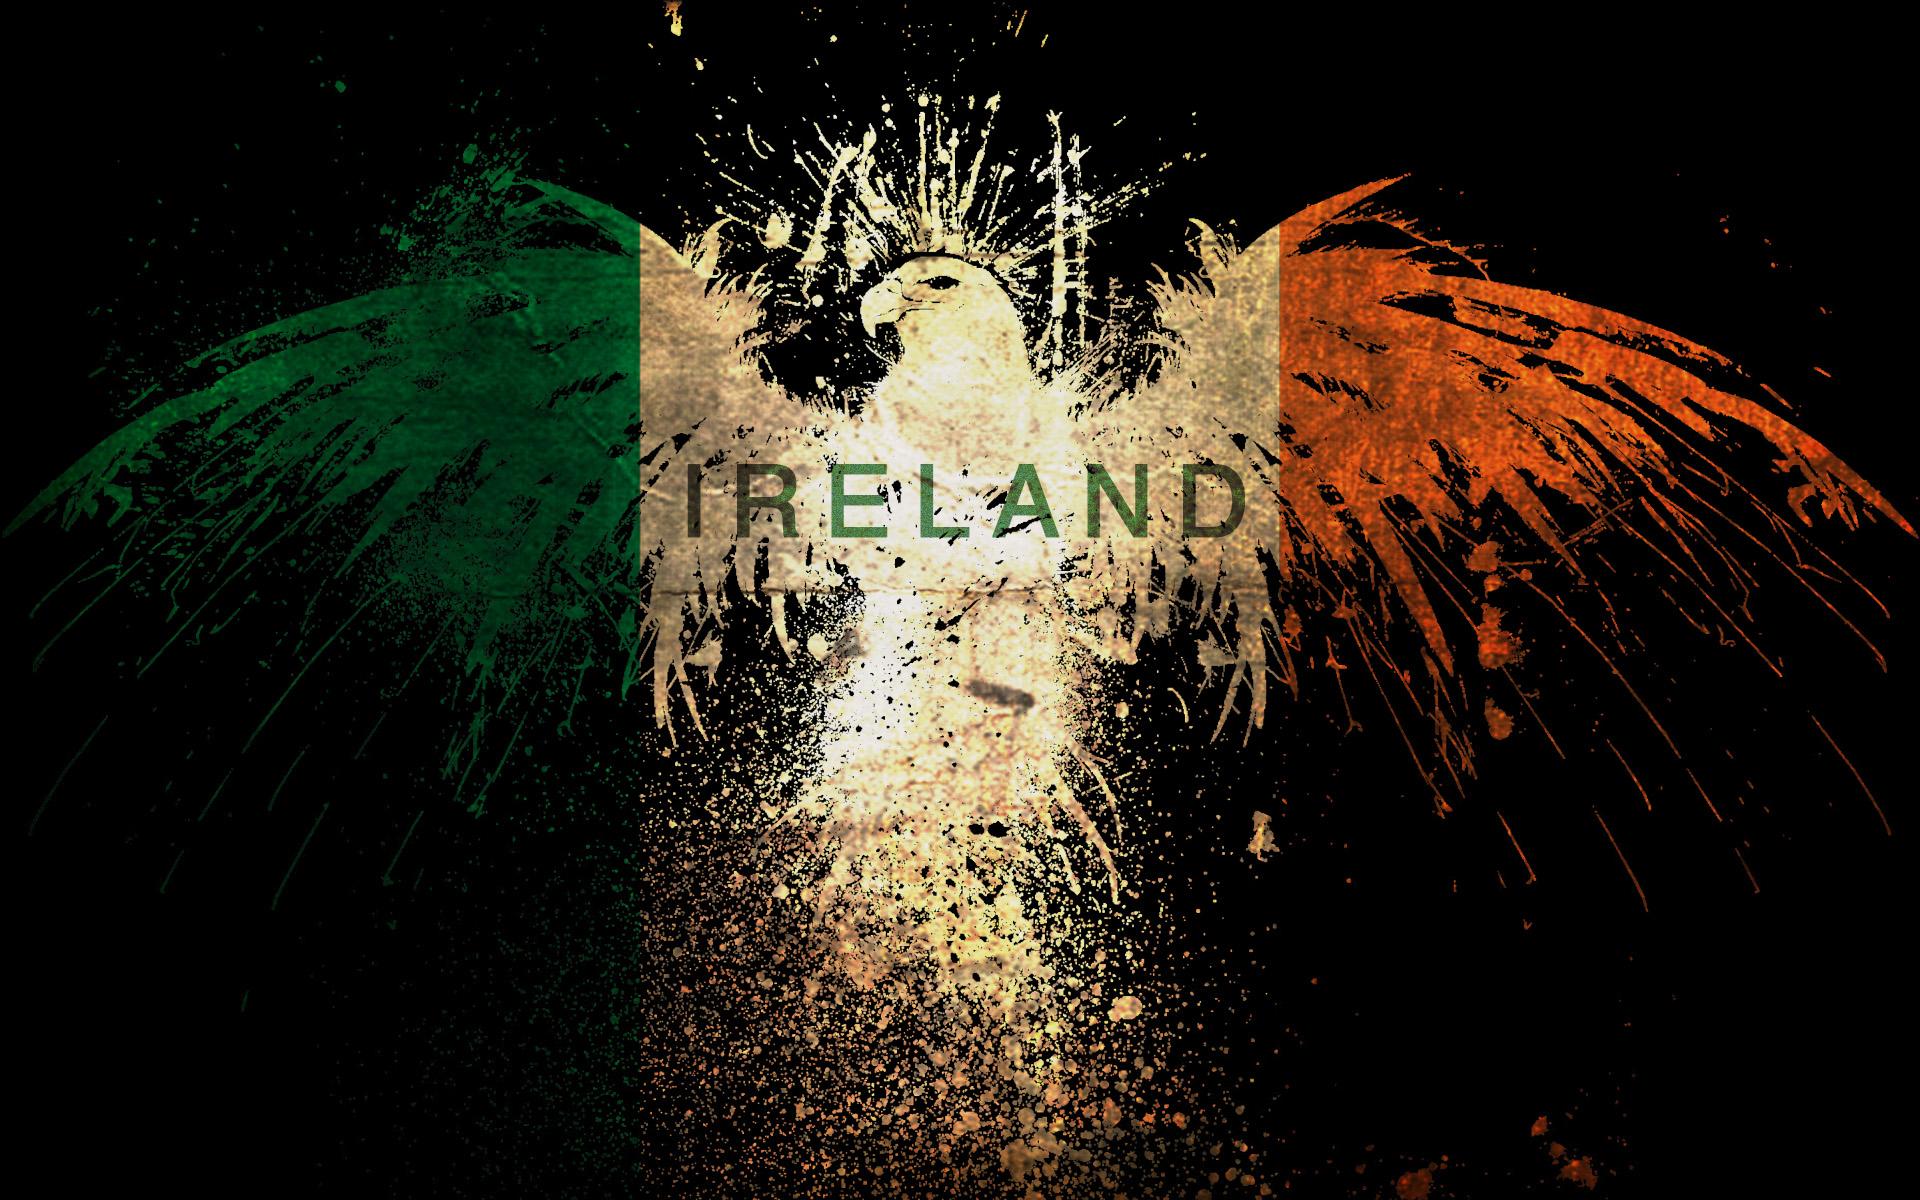 Celtic Irish Wallpaper  WallpaperSafari